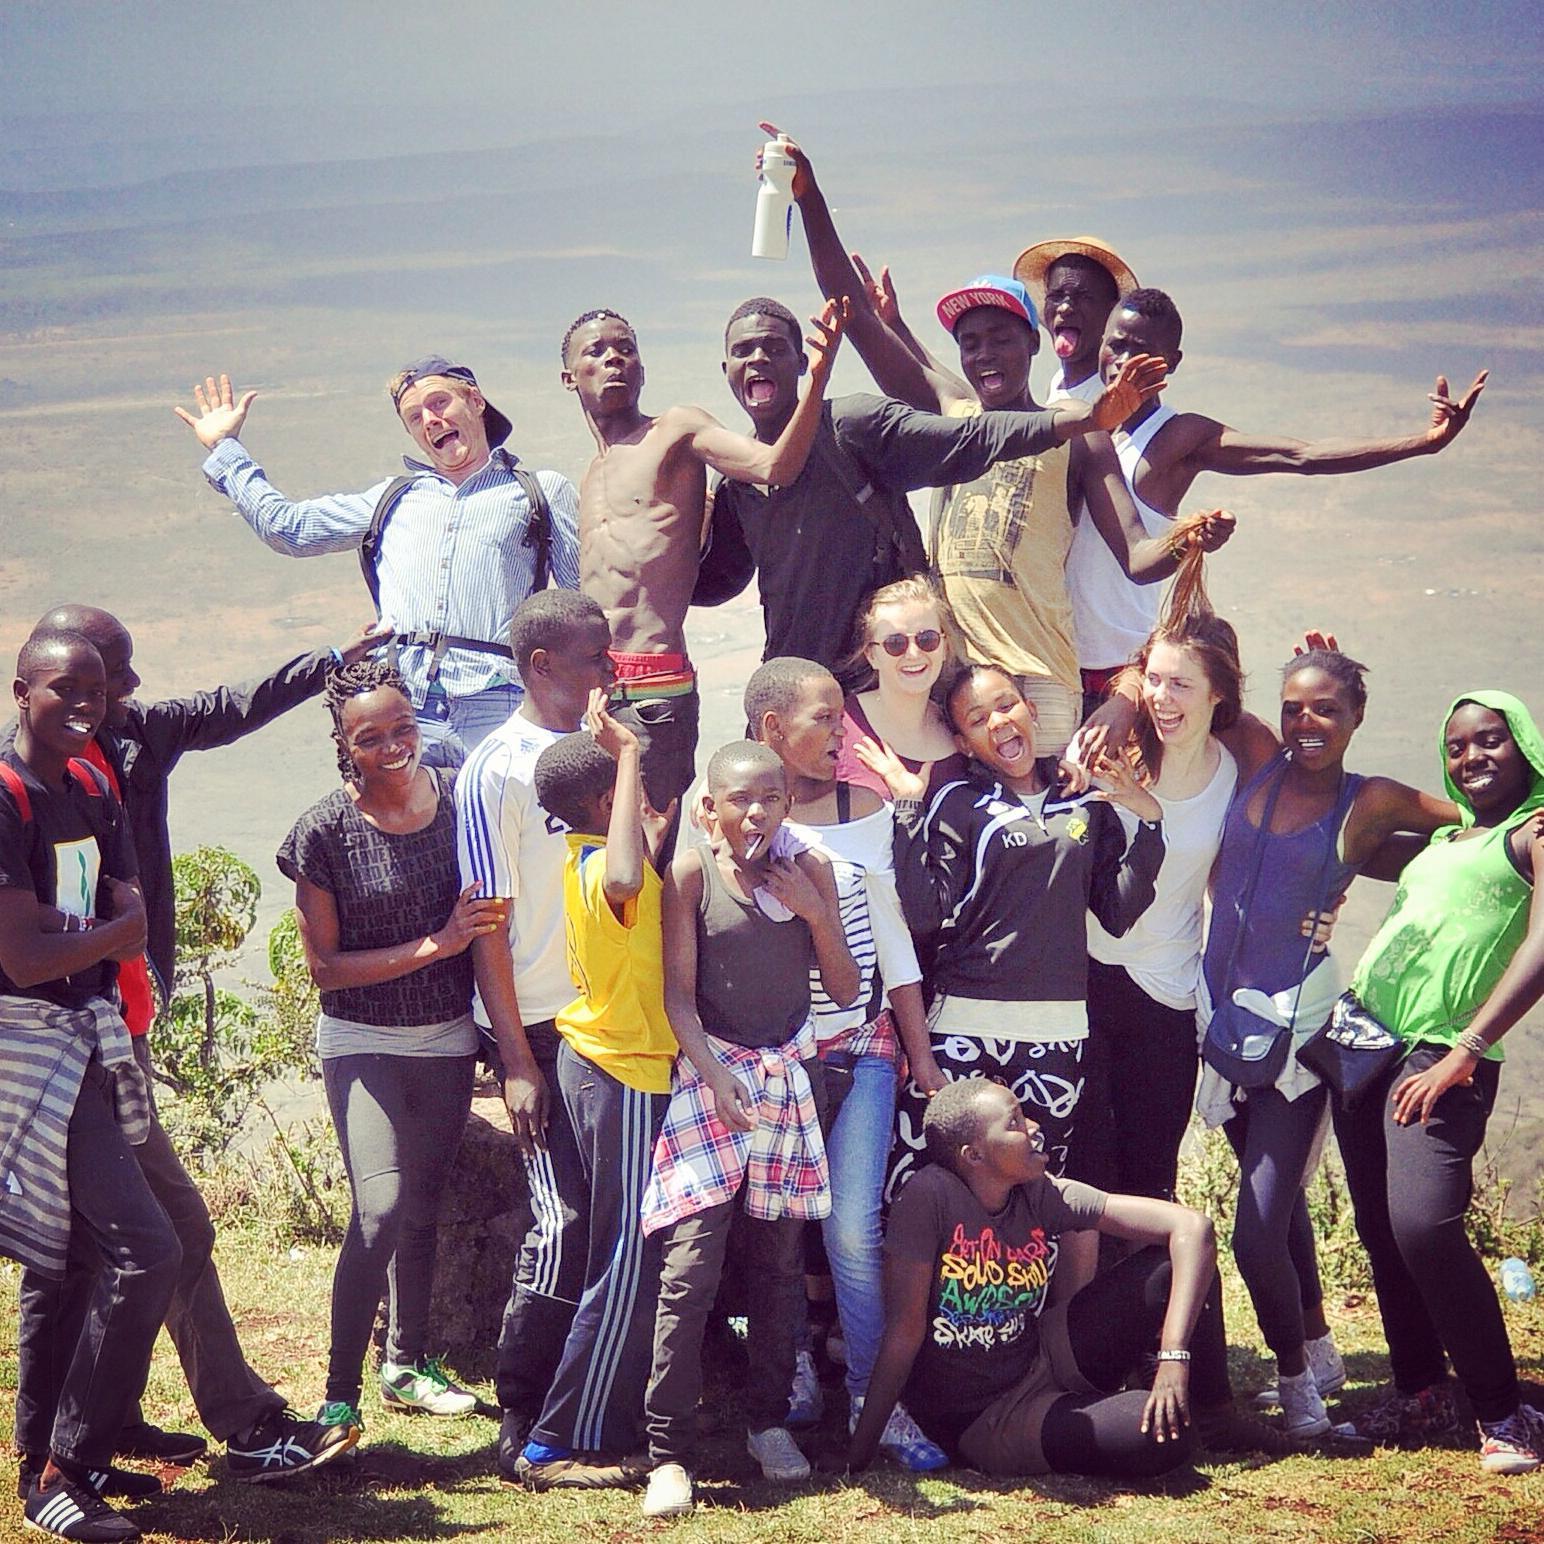 Wale Wale Kenya On Twitter Last Week We Had A Chance To